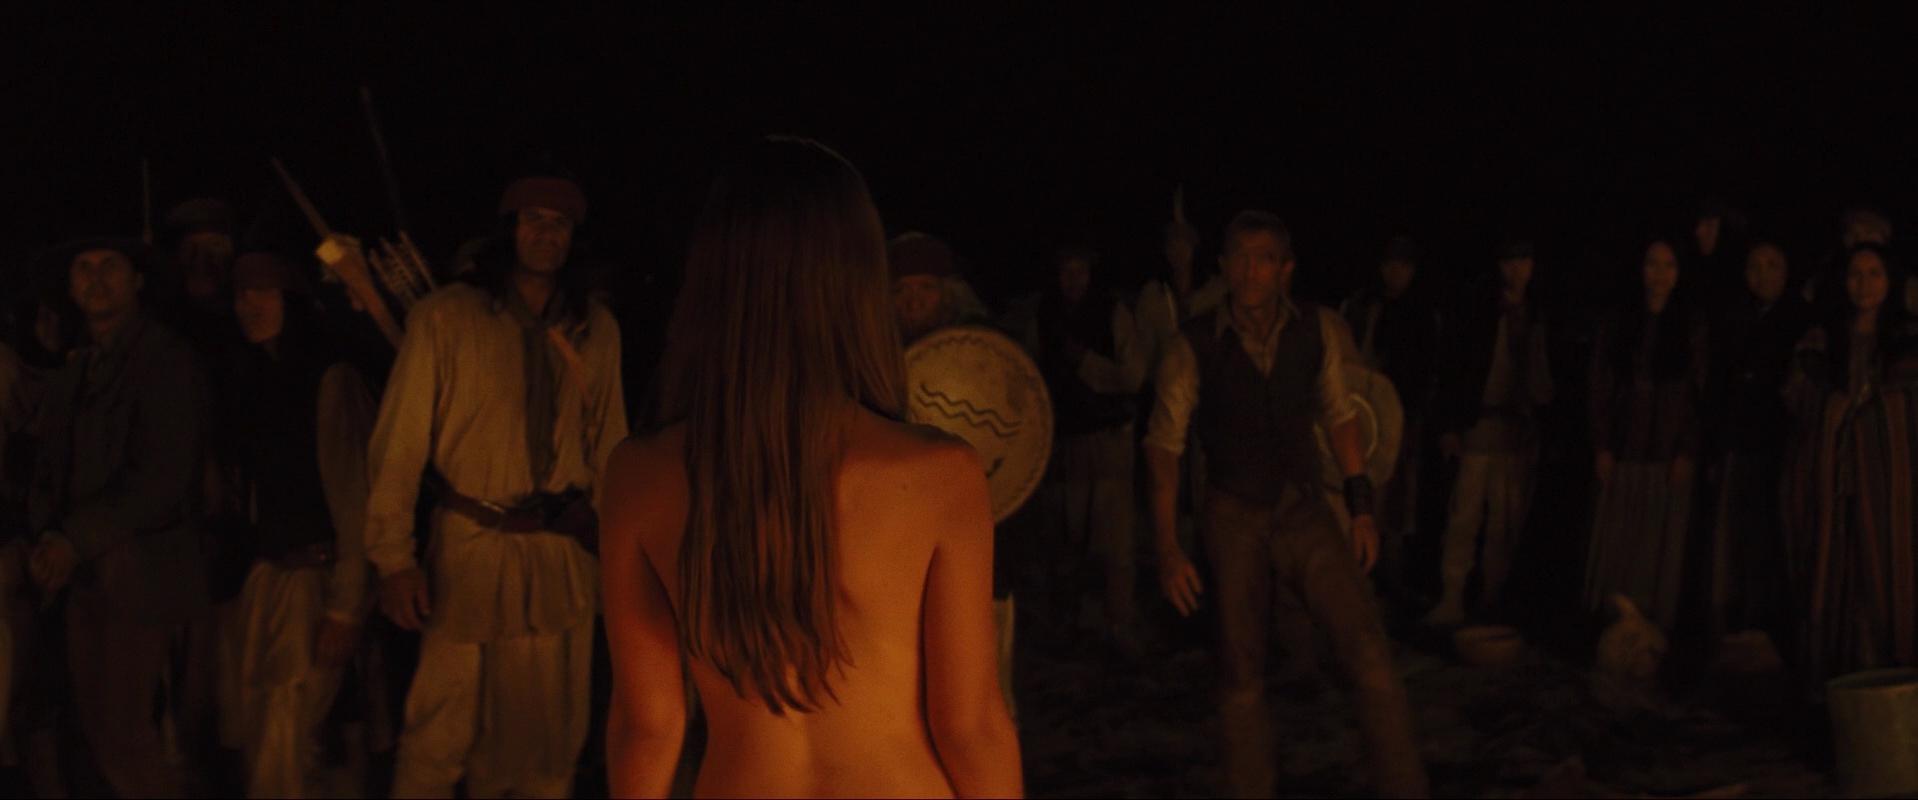 sex-and-the-single-alien-nude-scenes